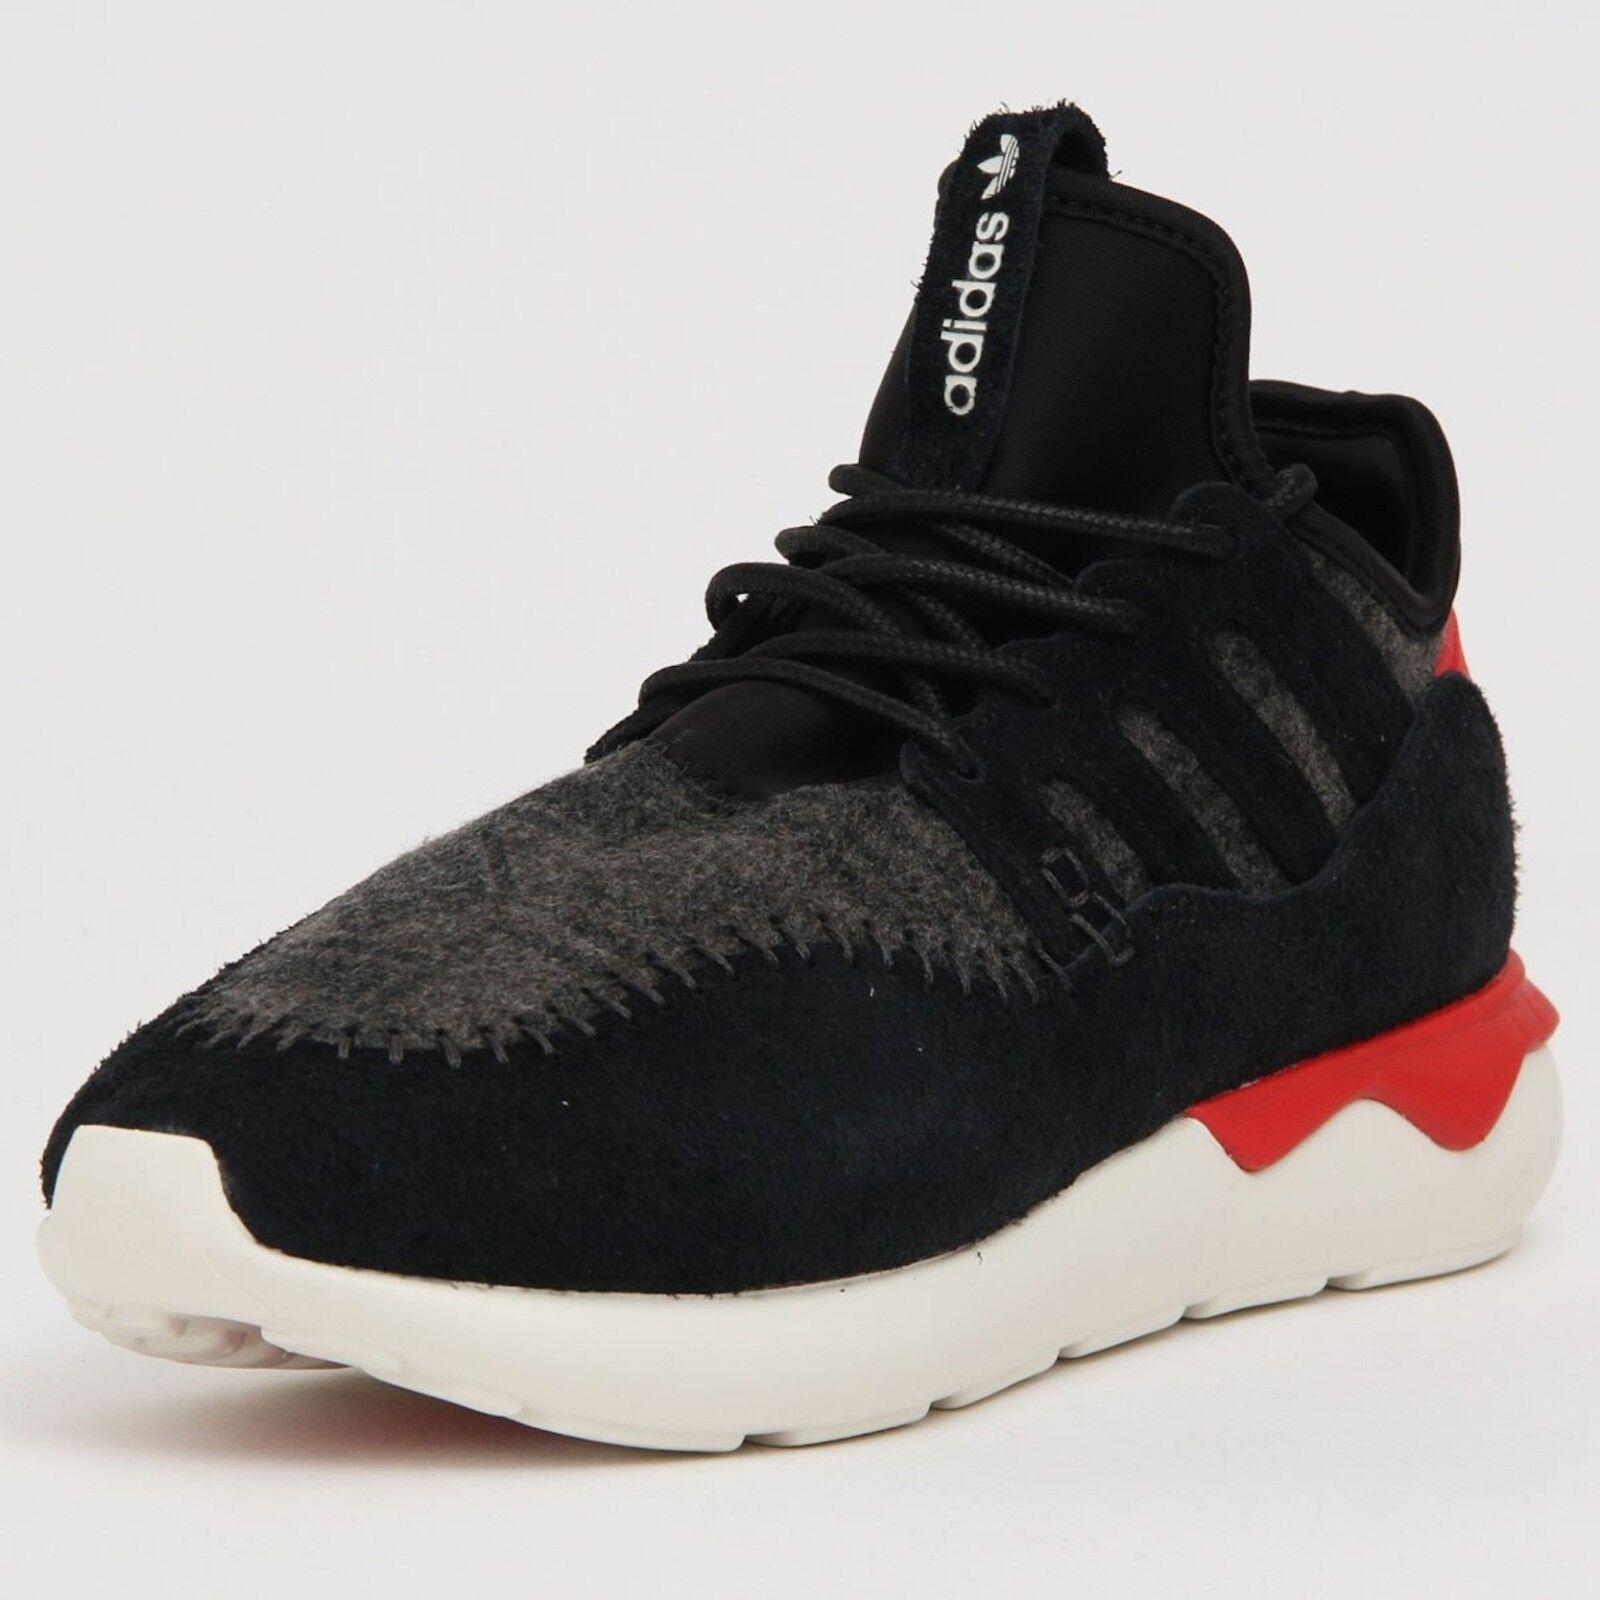 Adidas b24693 tubulare corre da ginnastica mocassino runner 11 nero e rosso pomodoro 11 runner nwt a90c85